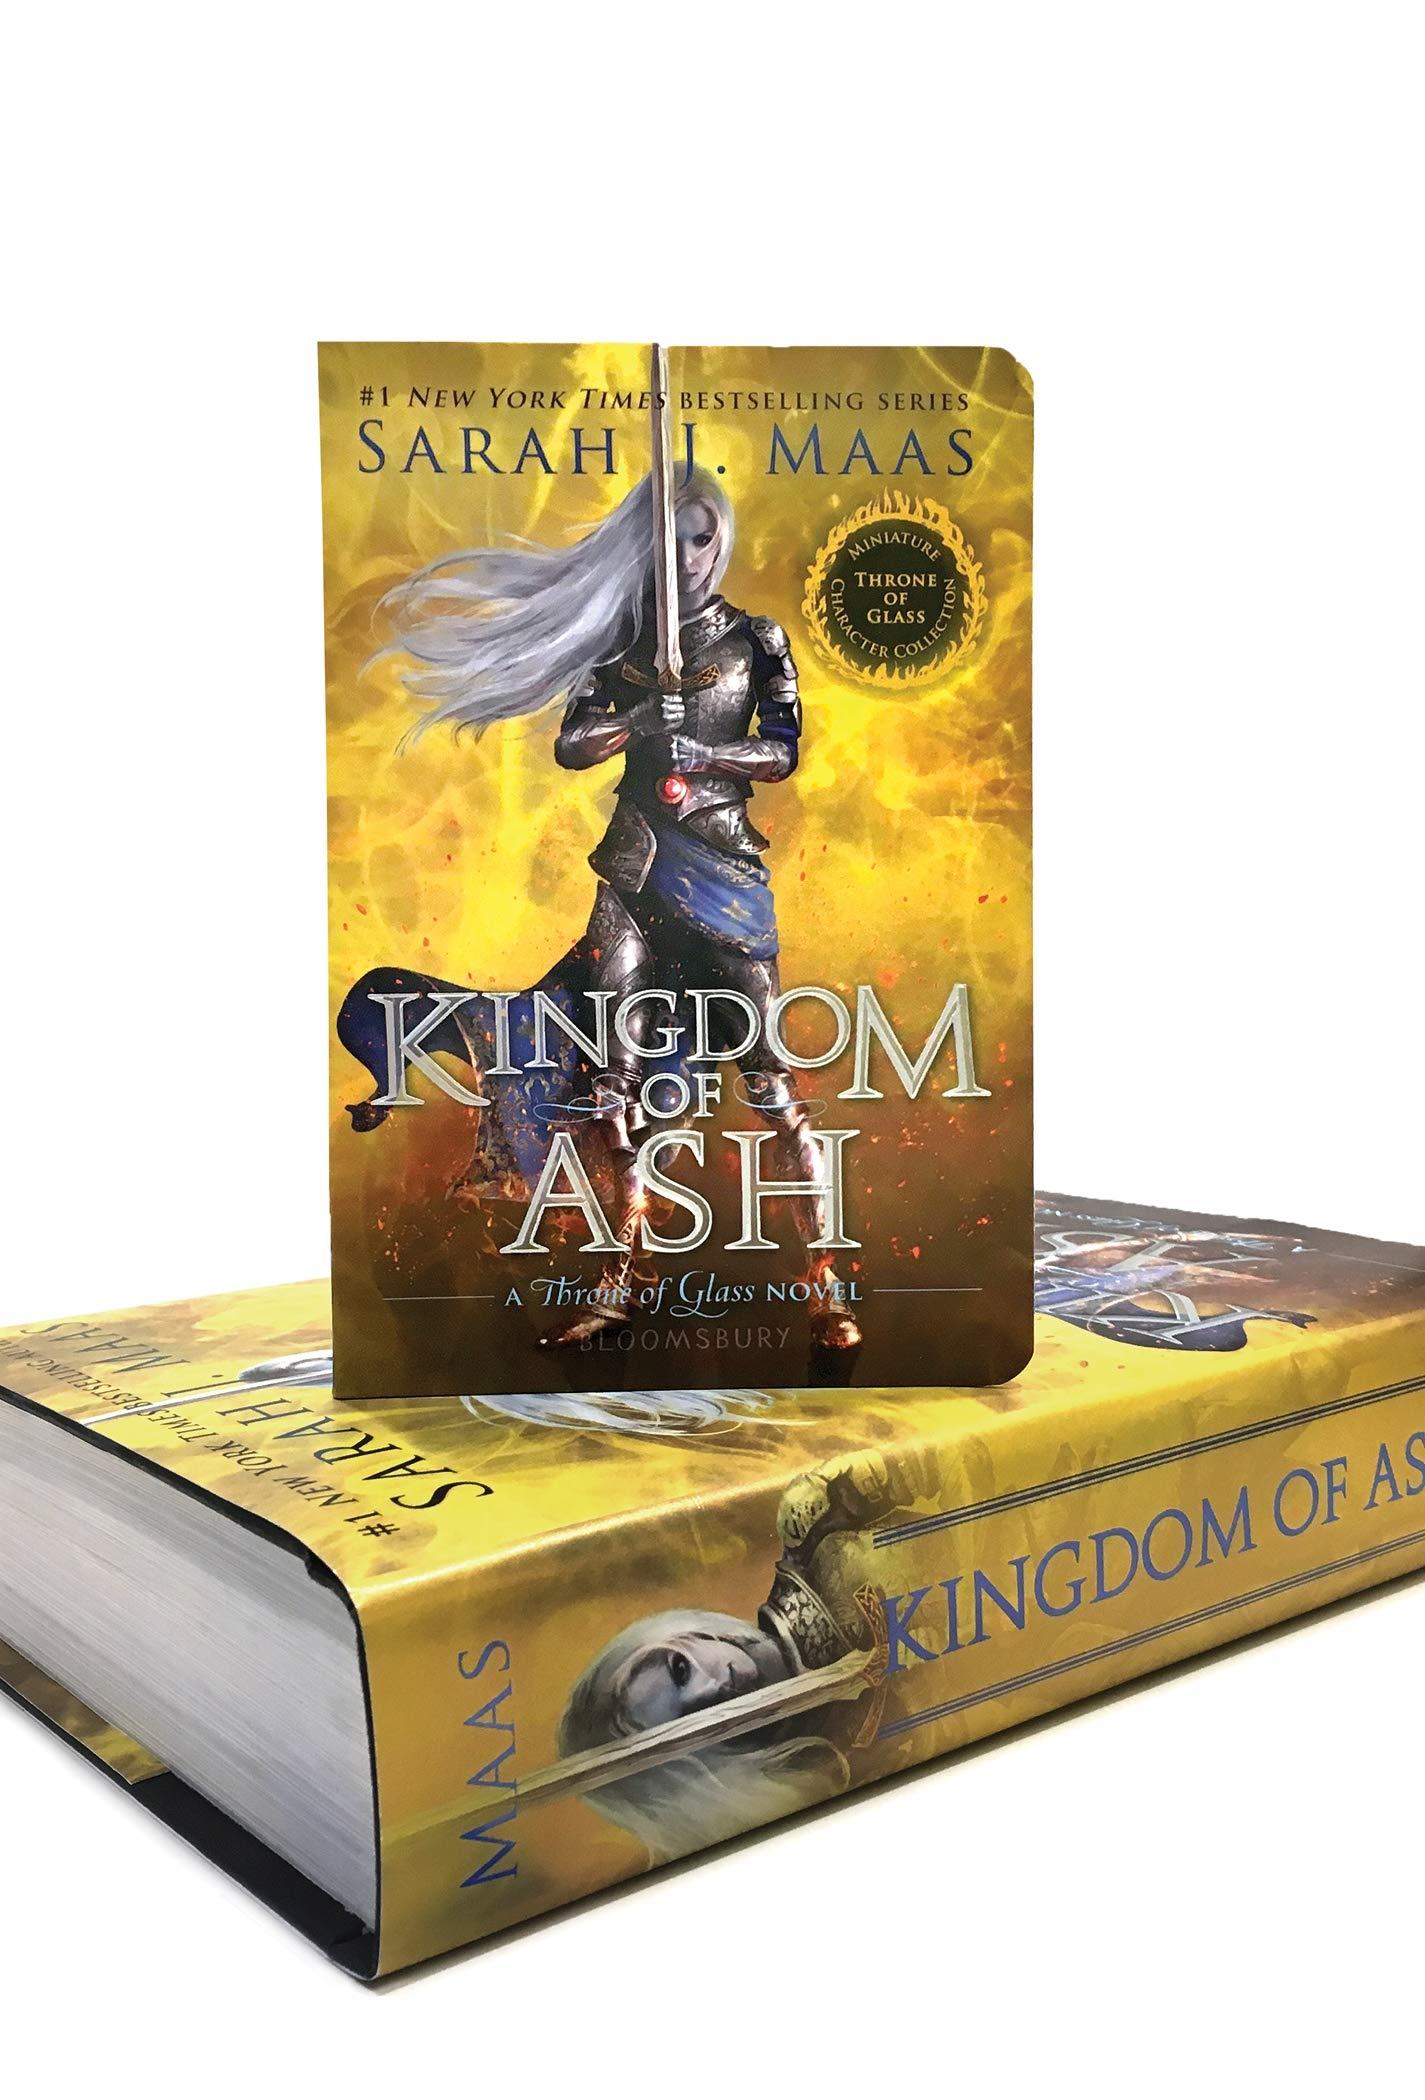 Kingdom of Ash Miniature Character Collection Throne of Glass: Amazon.es: Maas, Sarah J.: Libros en idiomas extranjeros